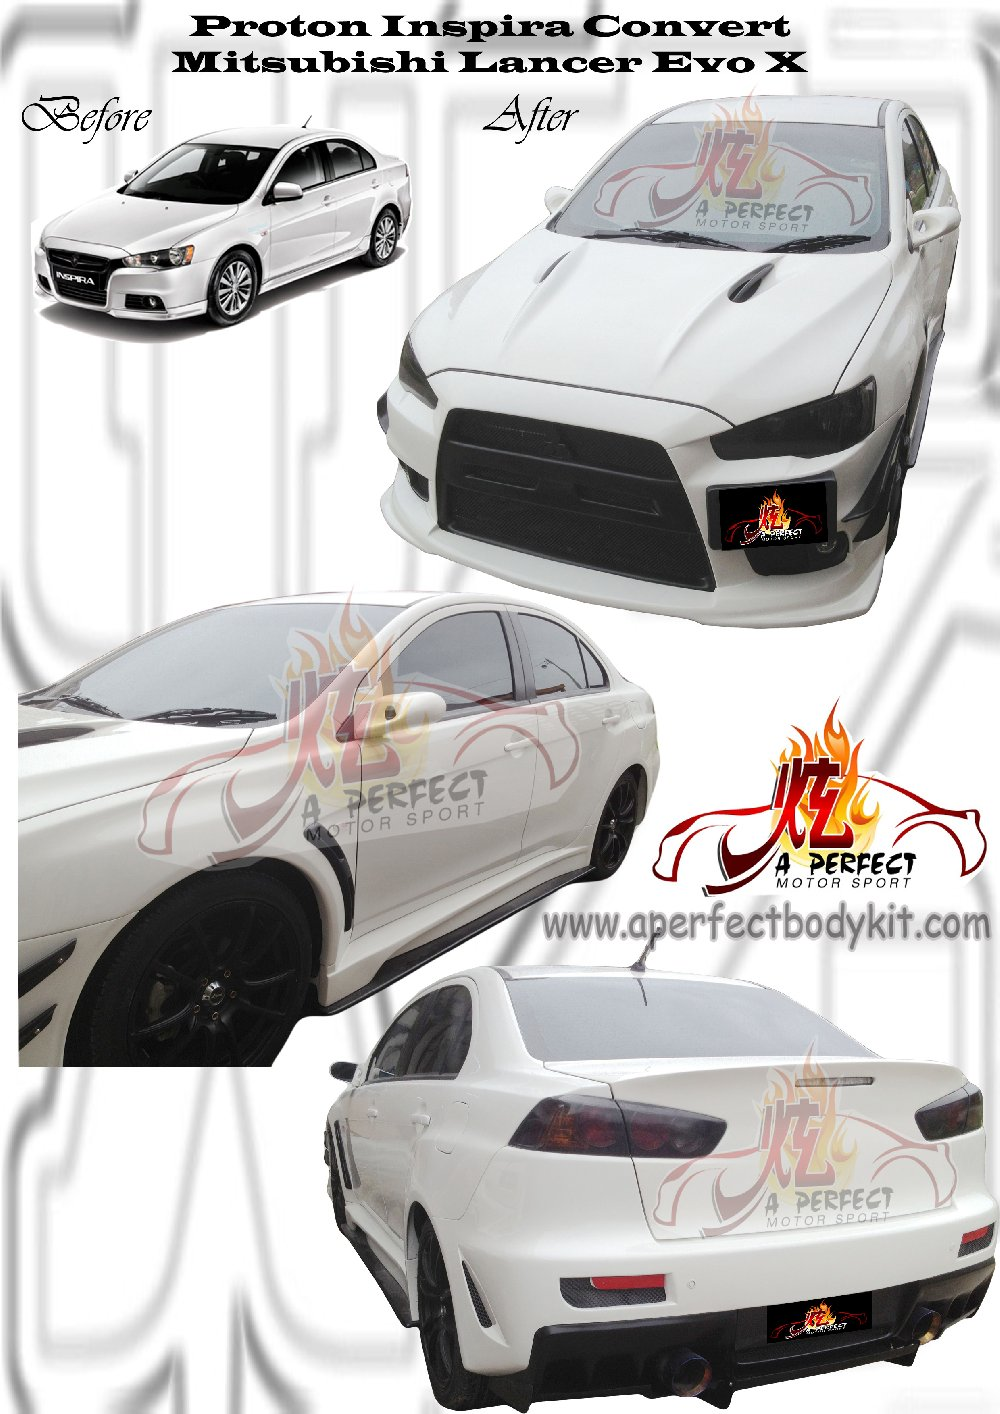 Proton Inspira Convert Mitsubishi Lancer Evo X Custom Body